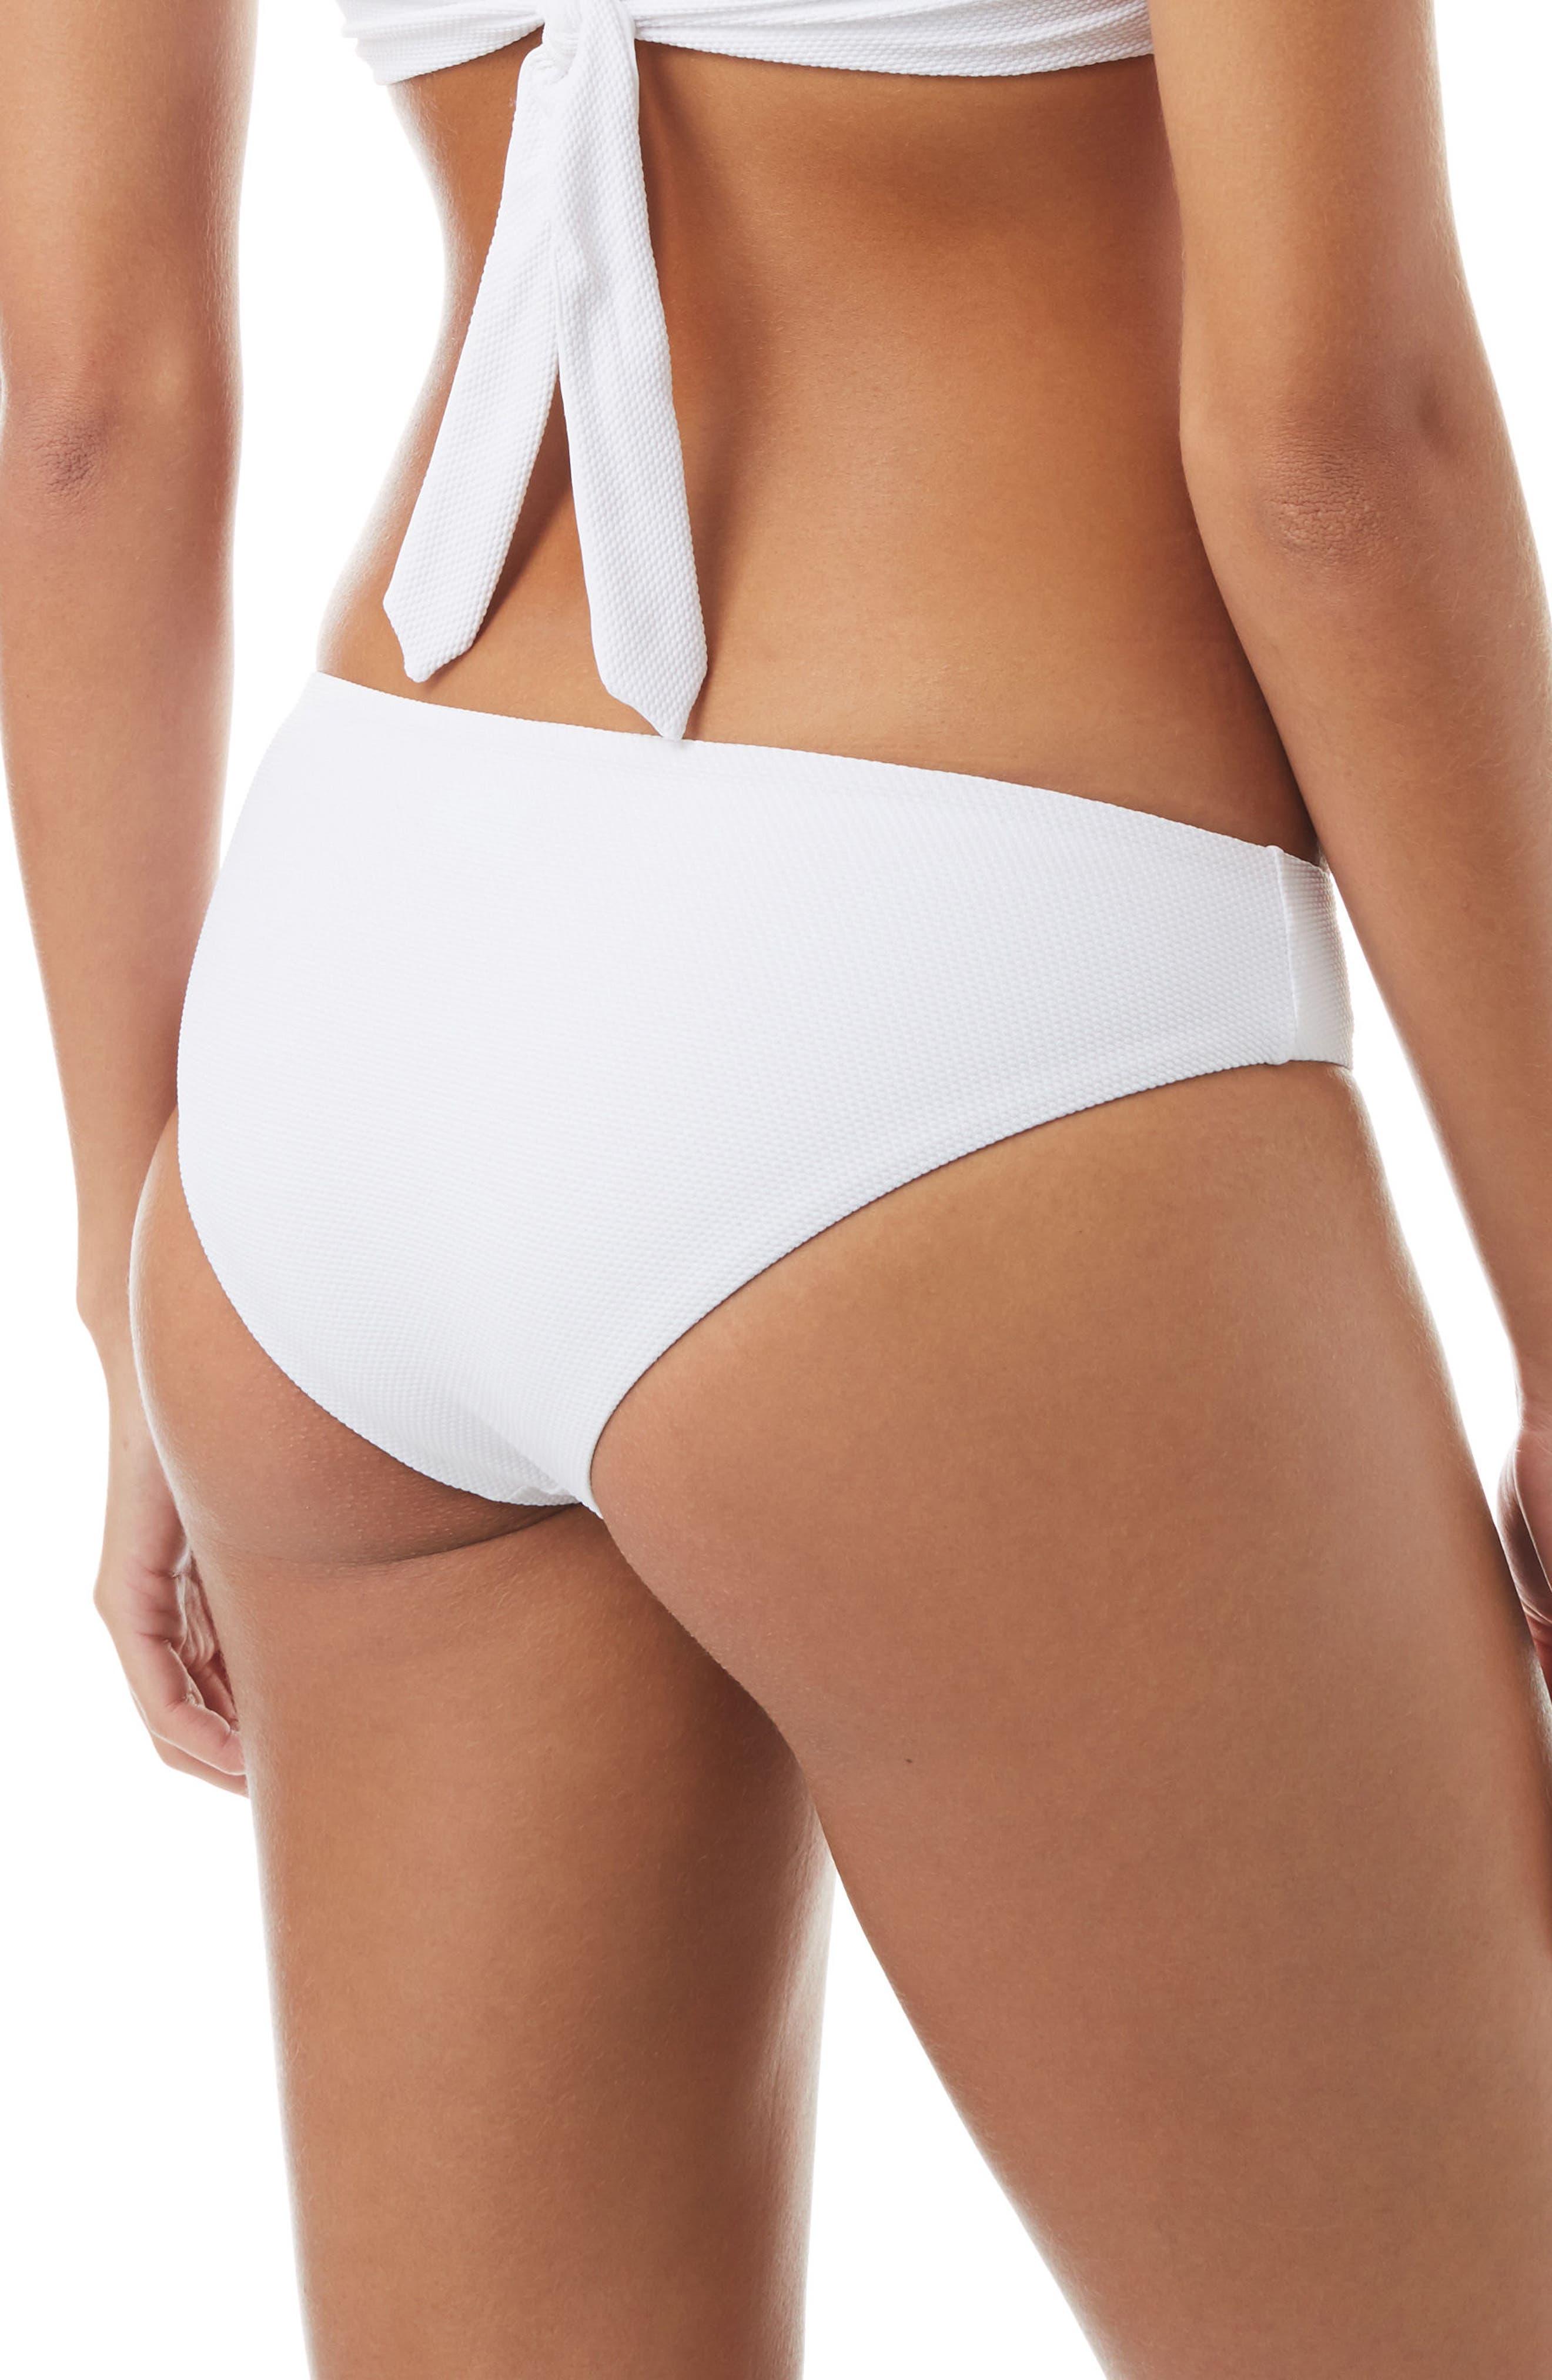 Africa Bikini Bottoms,                             Alternate thumbnail 2, color,                             PIQUE WHITE